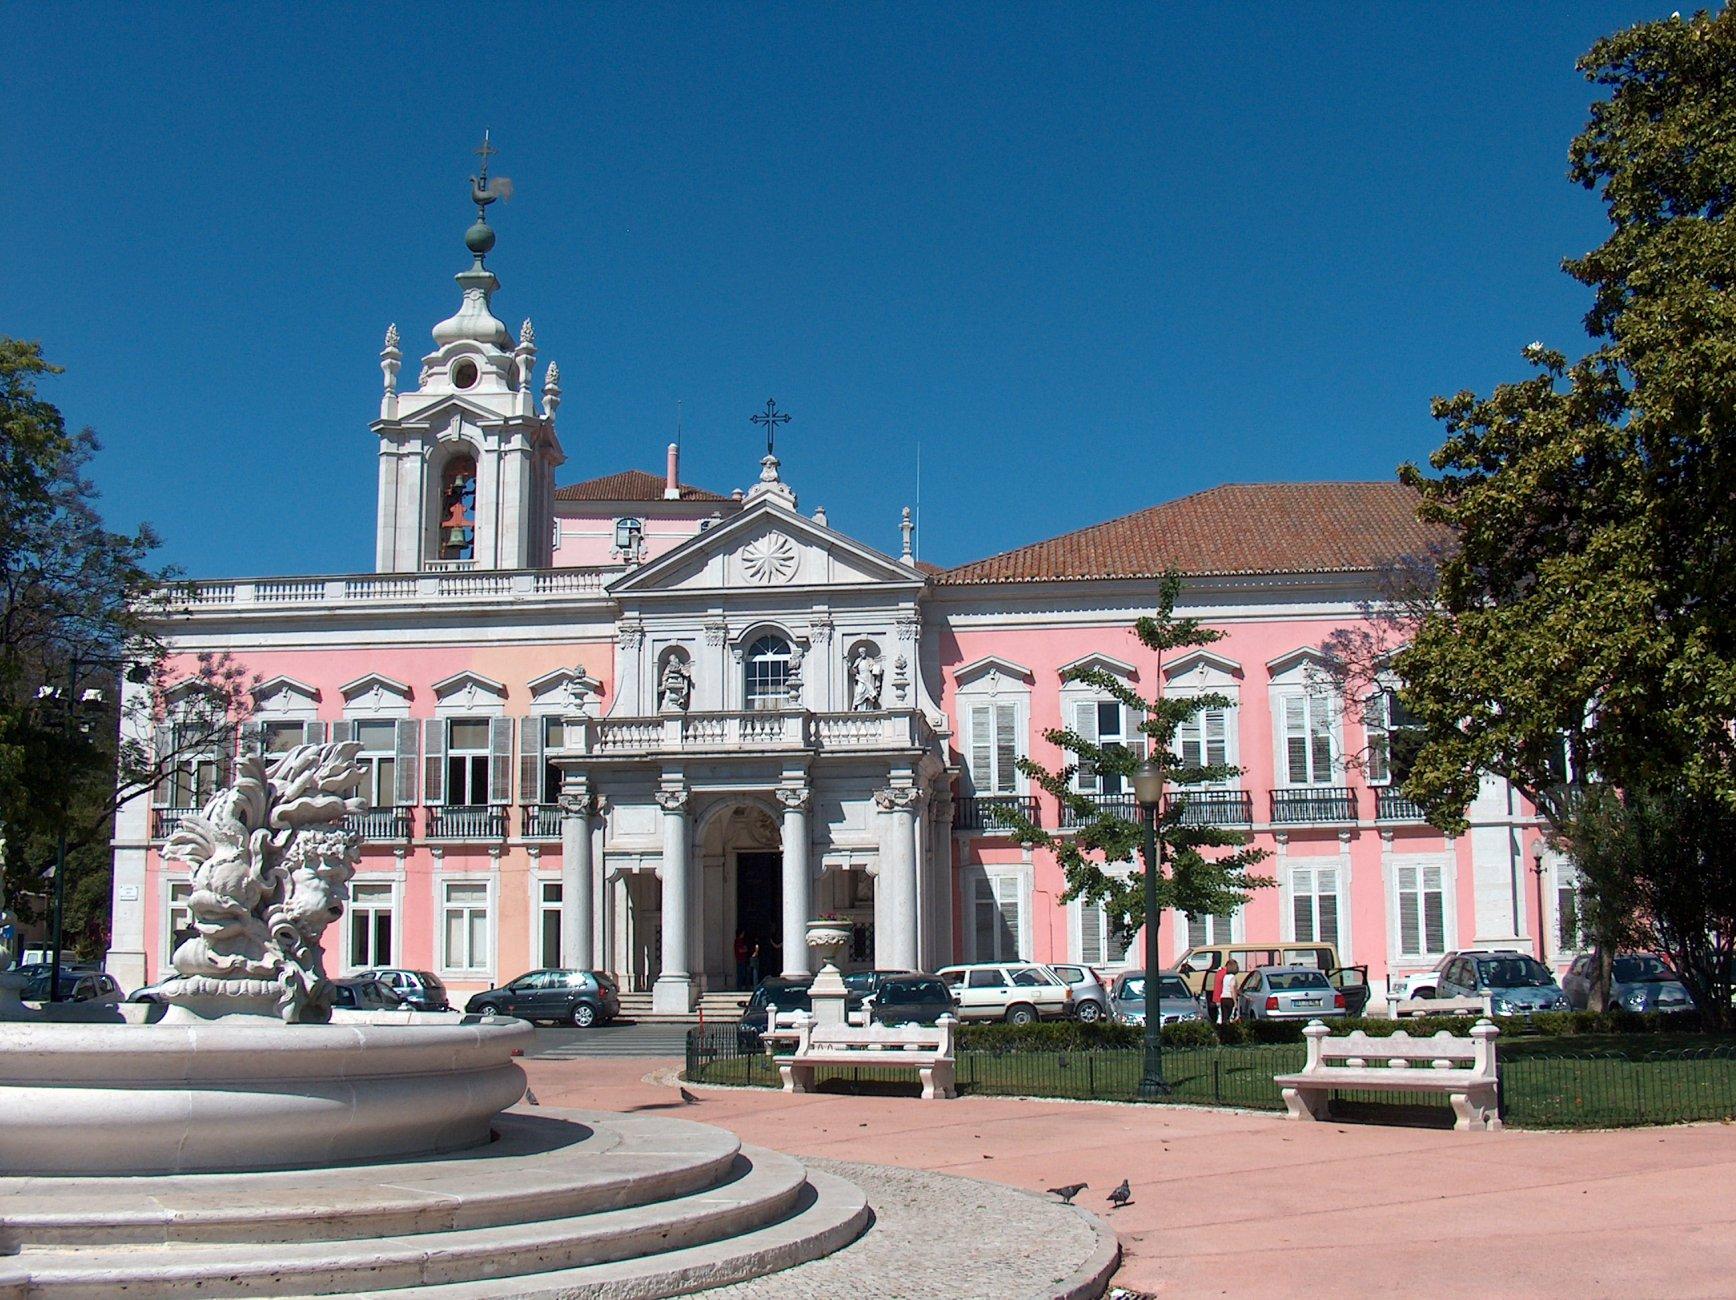 Palácio_das_Necessidades_1997.JPG